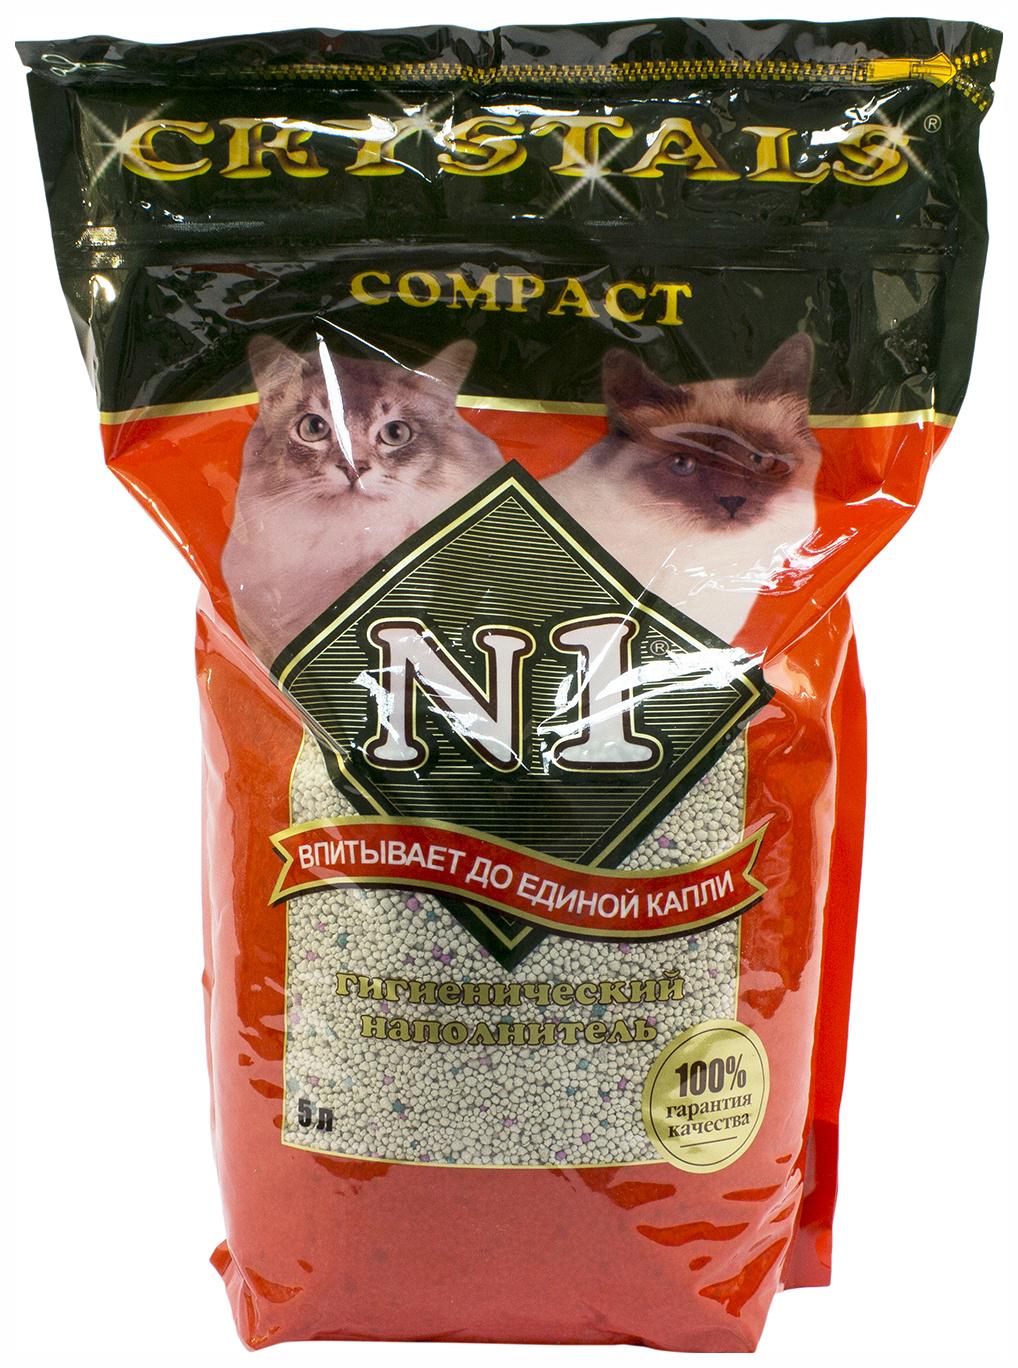 Наполнитель N1 Crystals комкующийся 5 л 4.21 кг без запаха